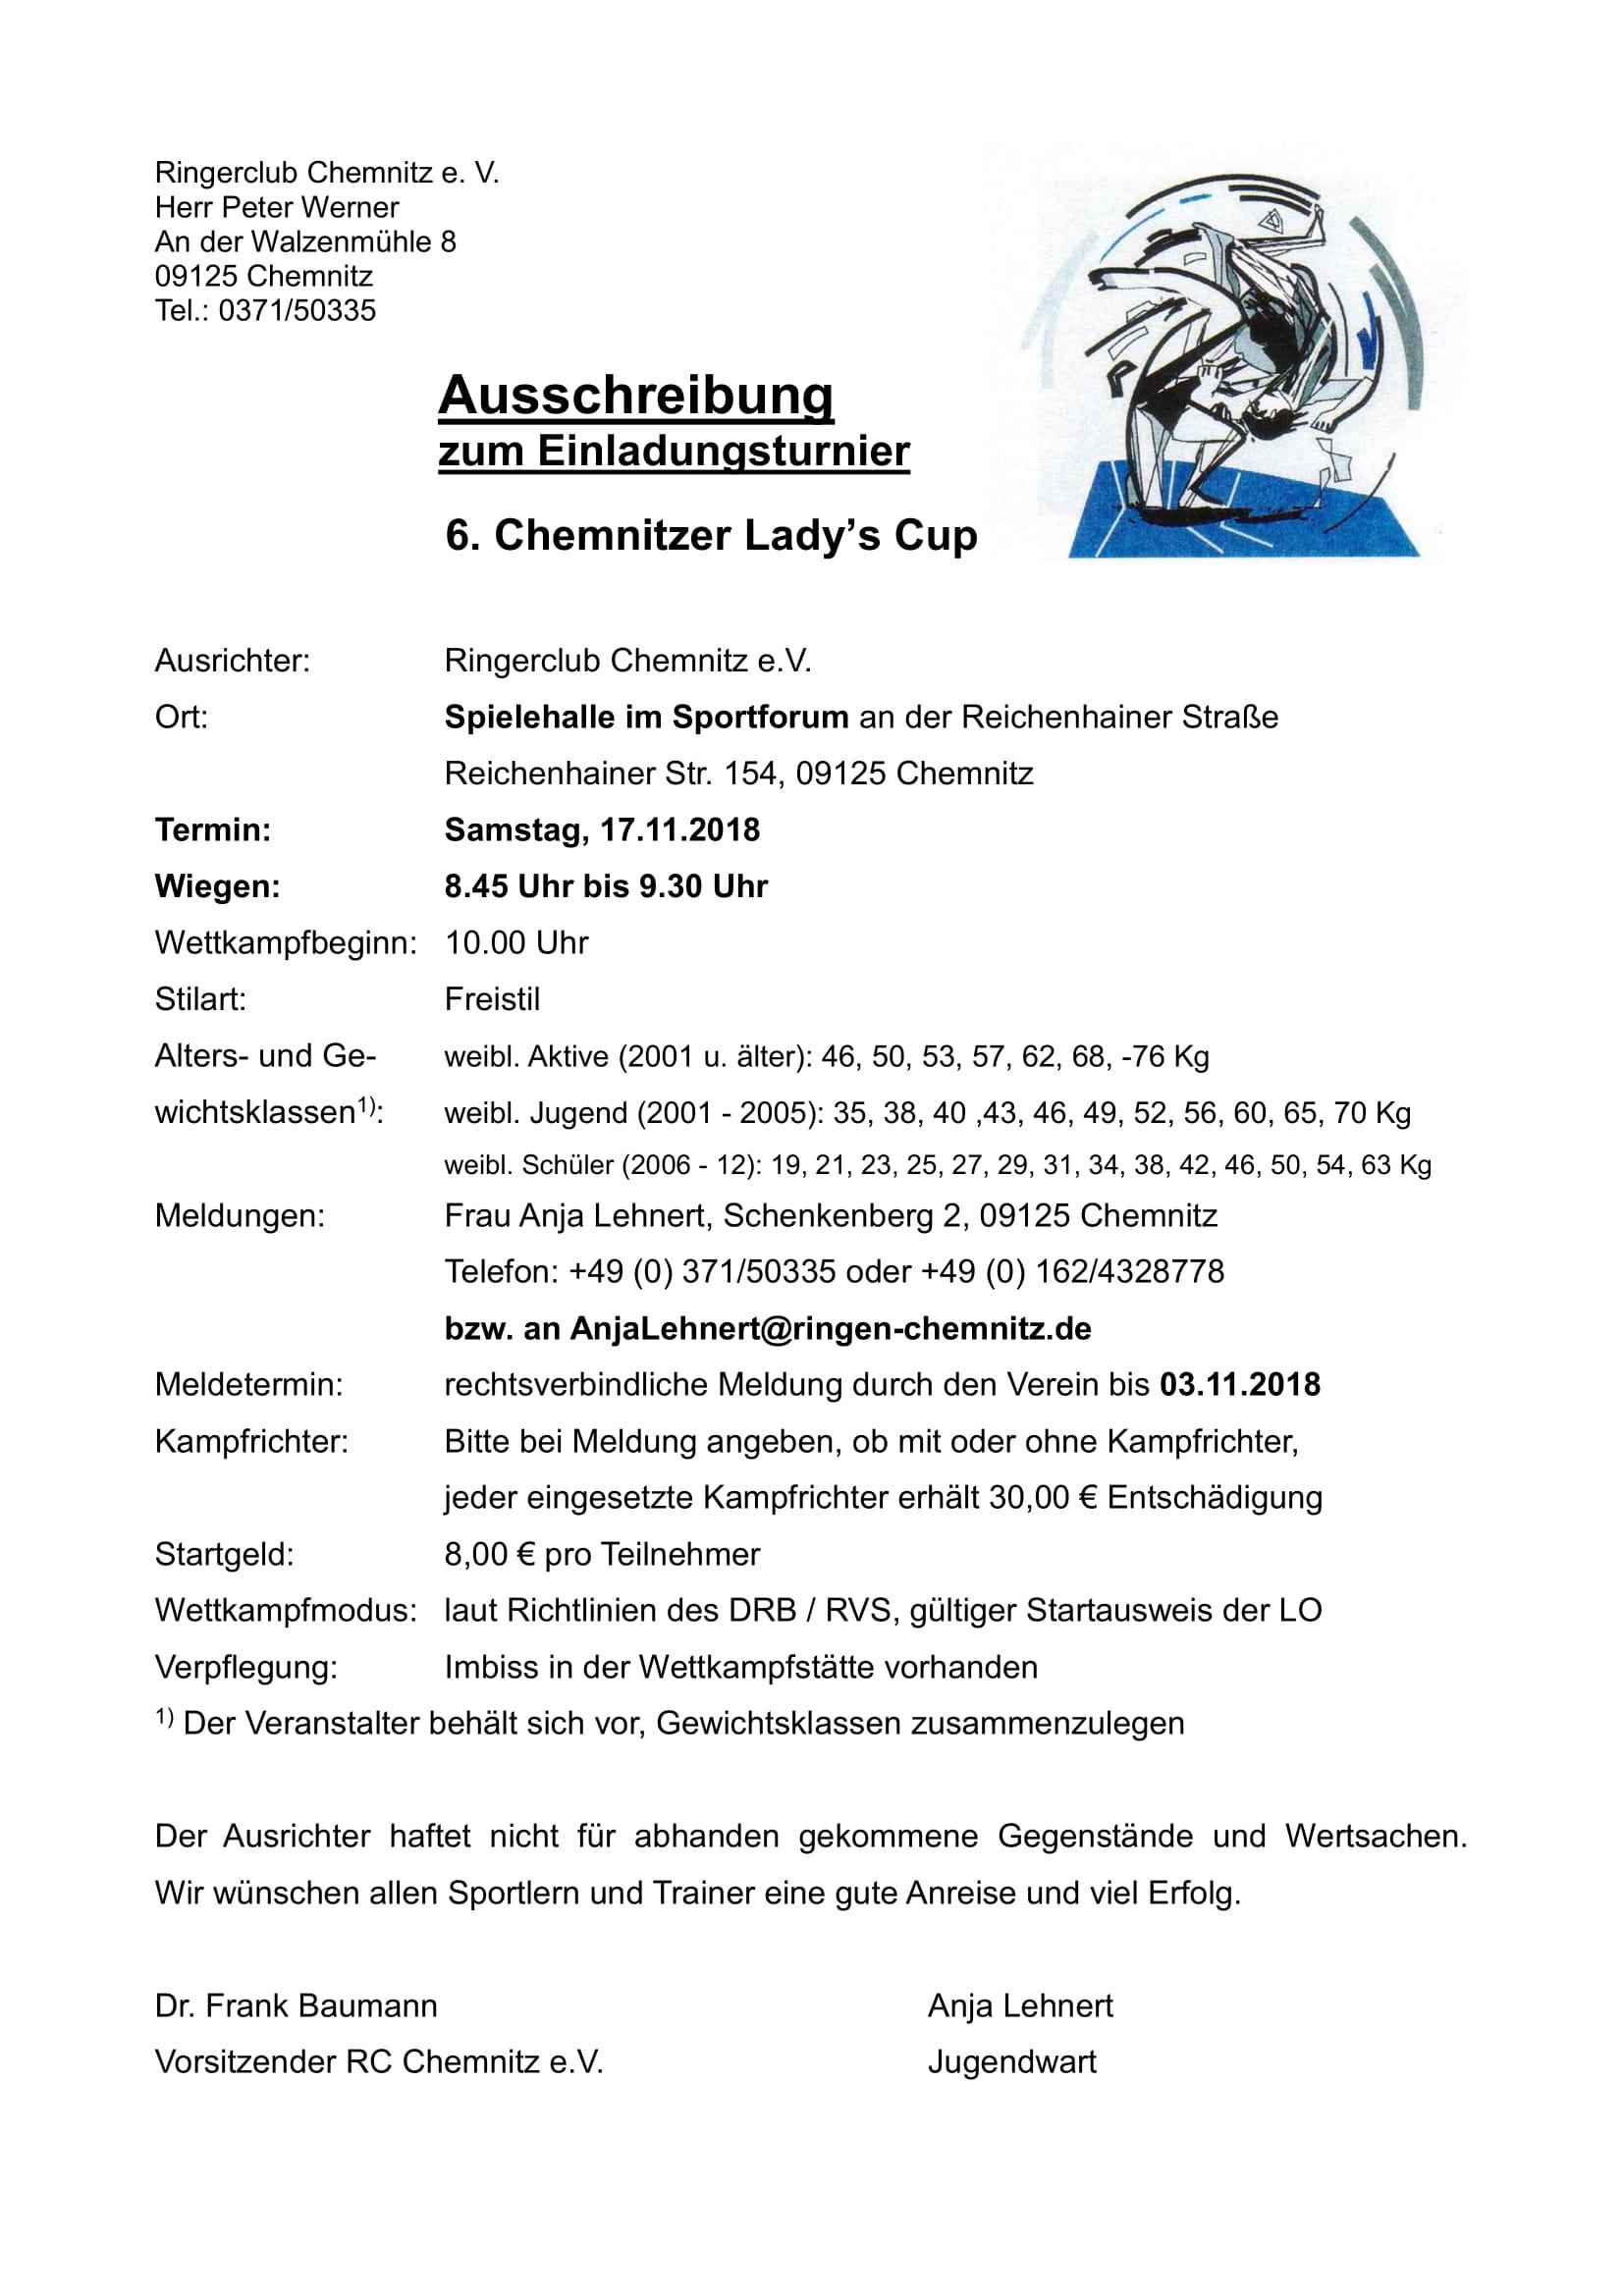 6. Chemnitzer Lady's Cup